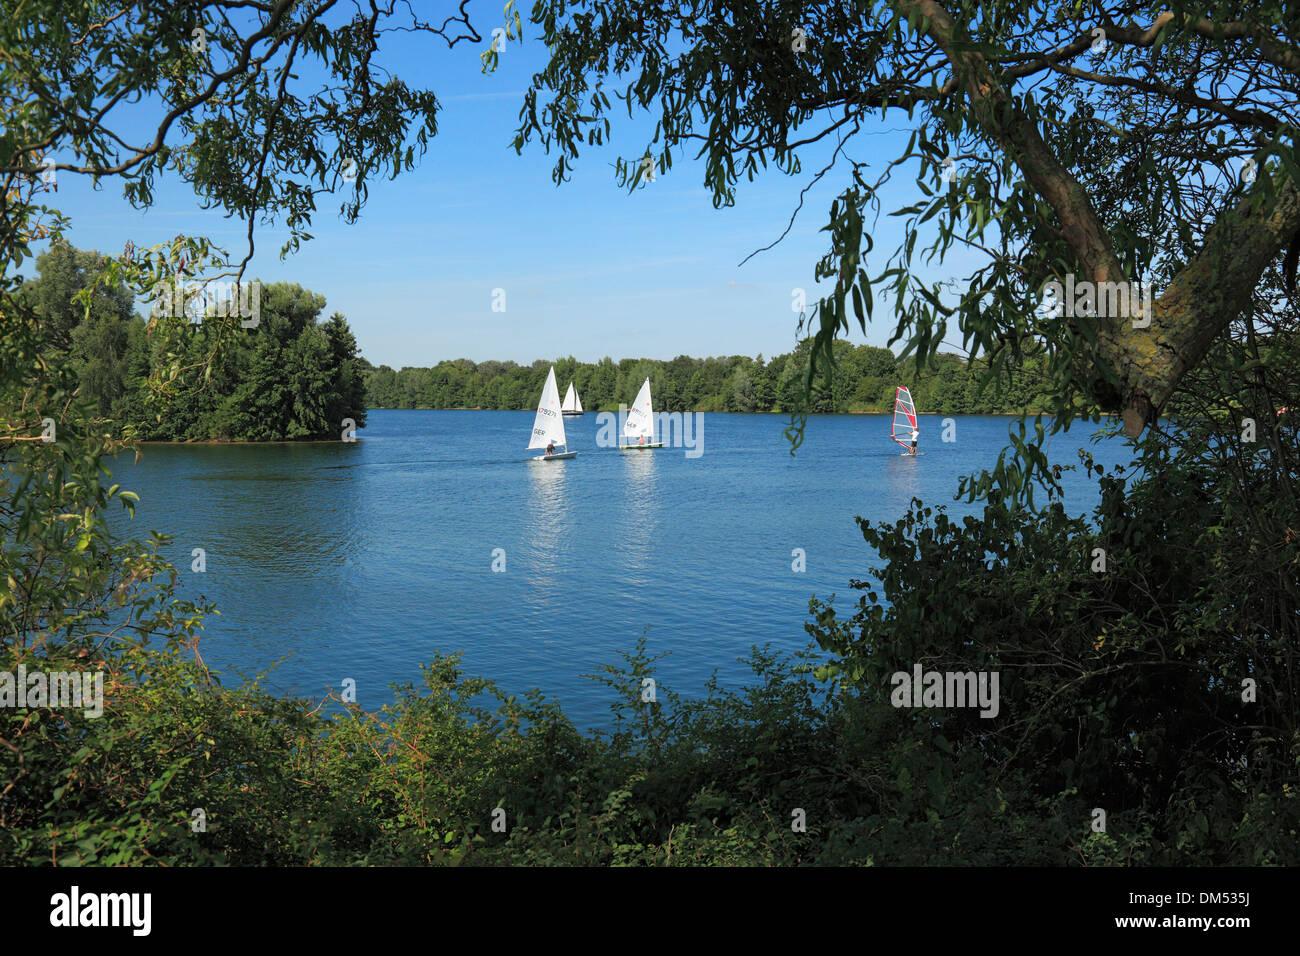 Germany, Krefeld, Rhine, Lower Rhine, Rhineland, North Rhine-Westphalia, Krefeld-Uerdingen, Elfrath lake, scenery, sail boats, - Stock Image